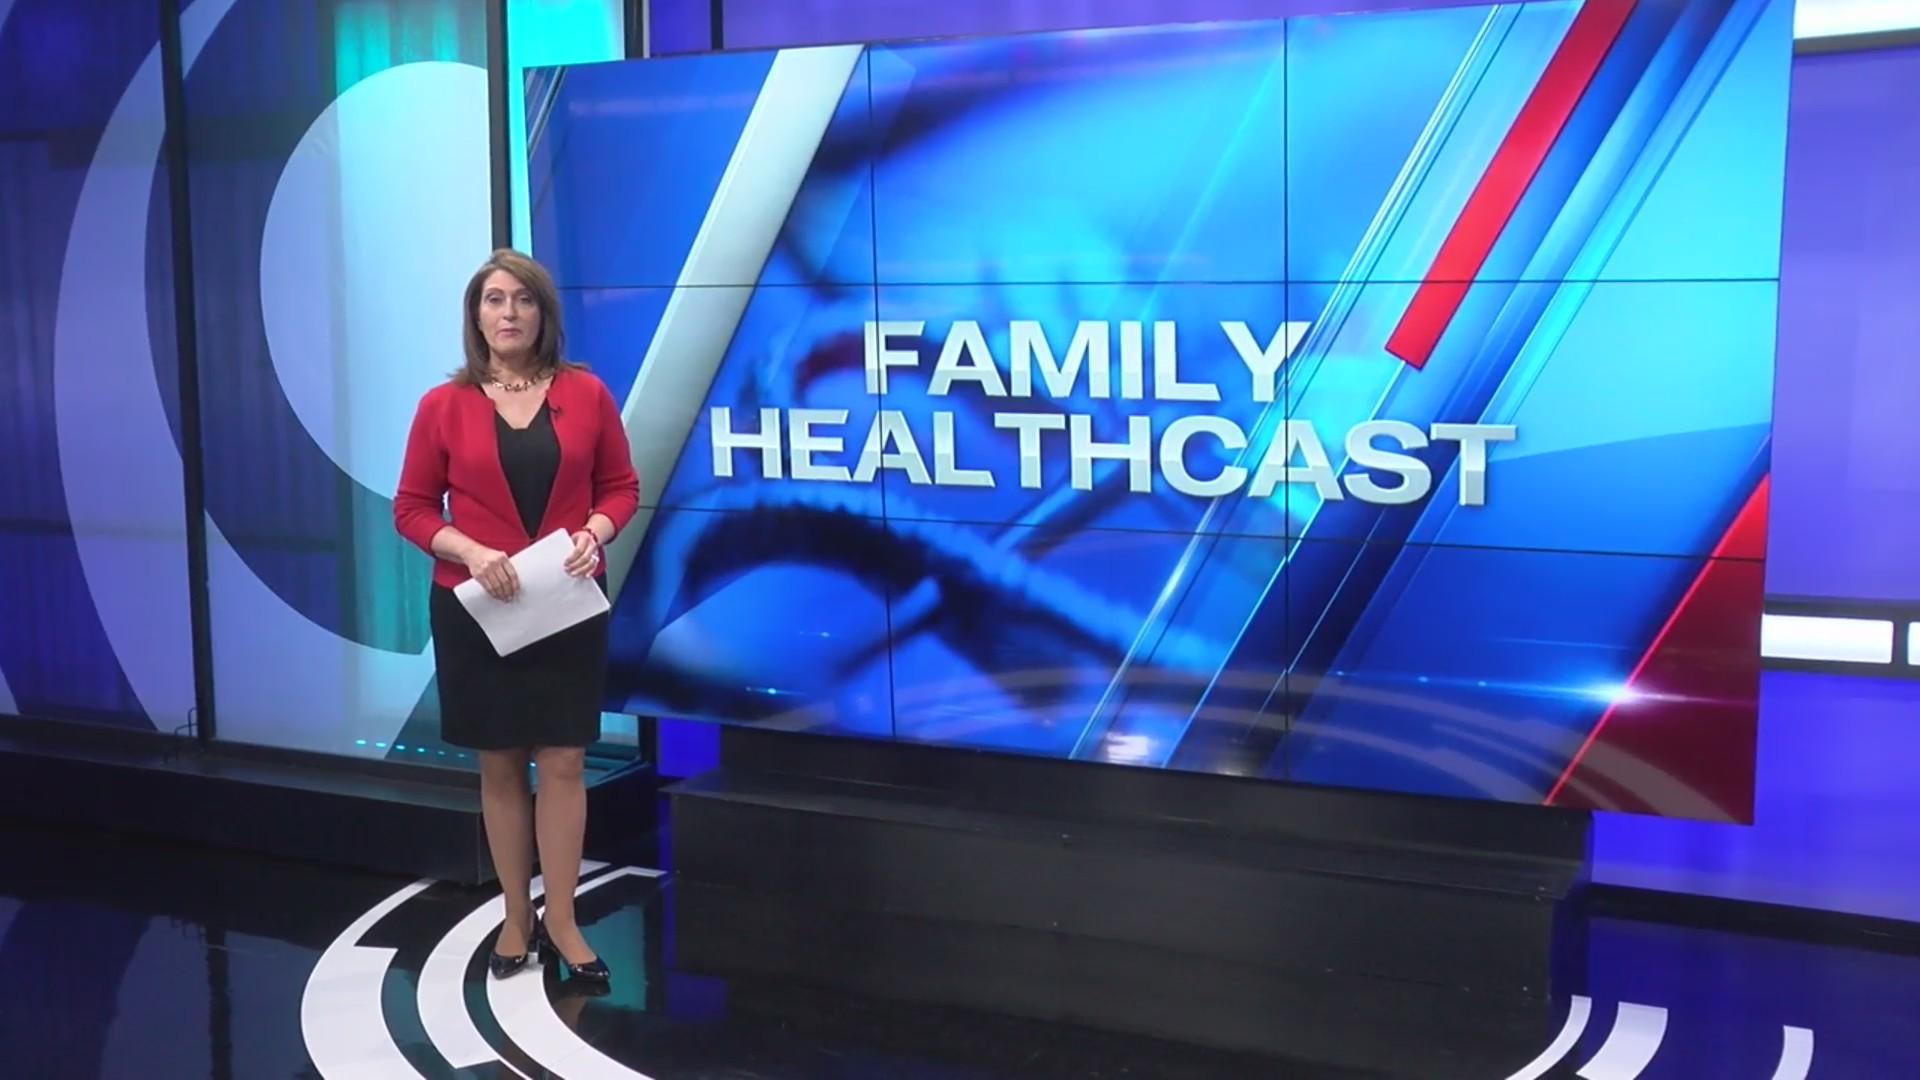 Family_Healthcast__5_21_19_0_20190521220349